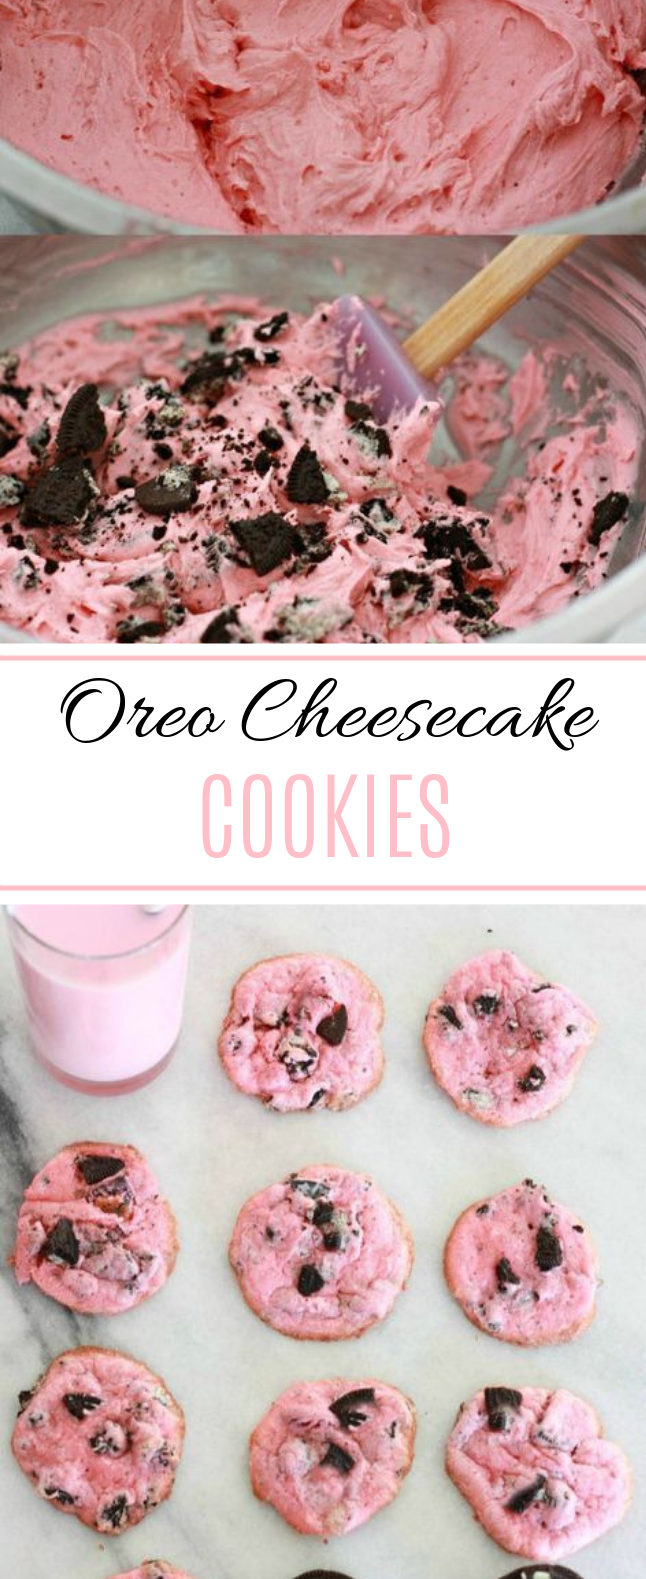 Oreo Cheesecake Cookies #cookies #easy